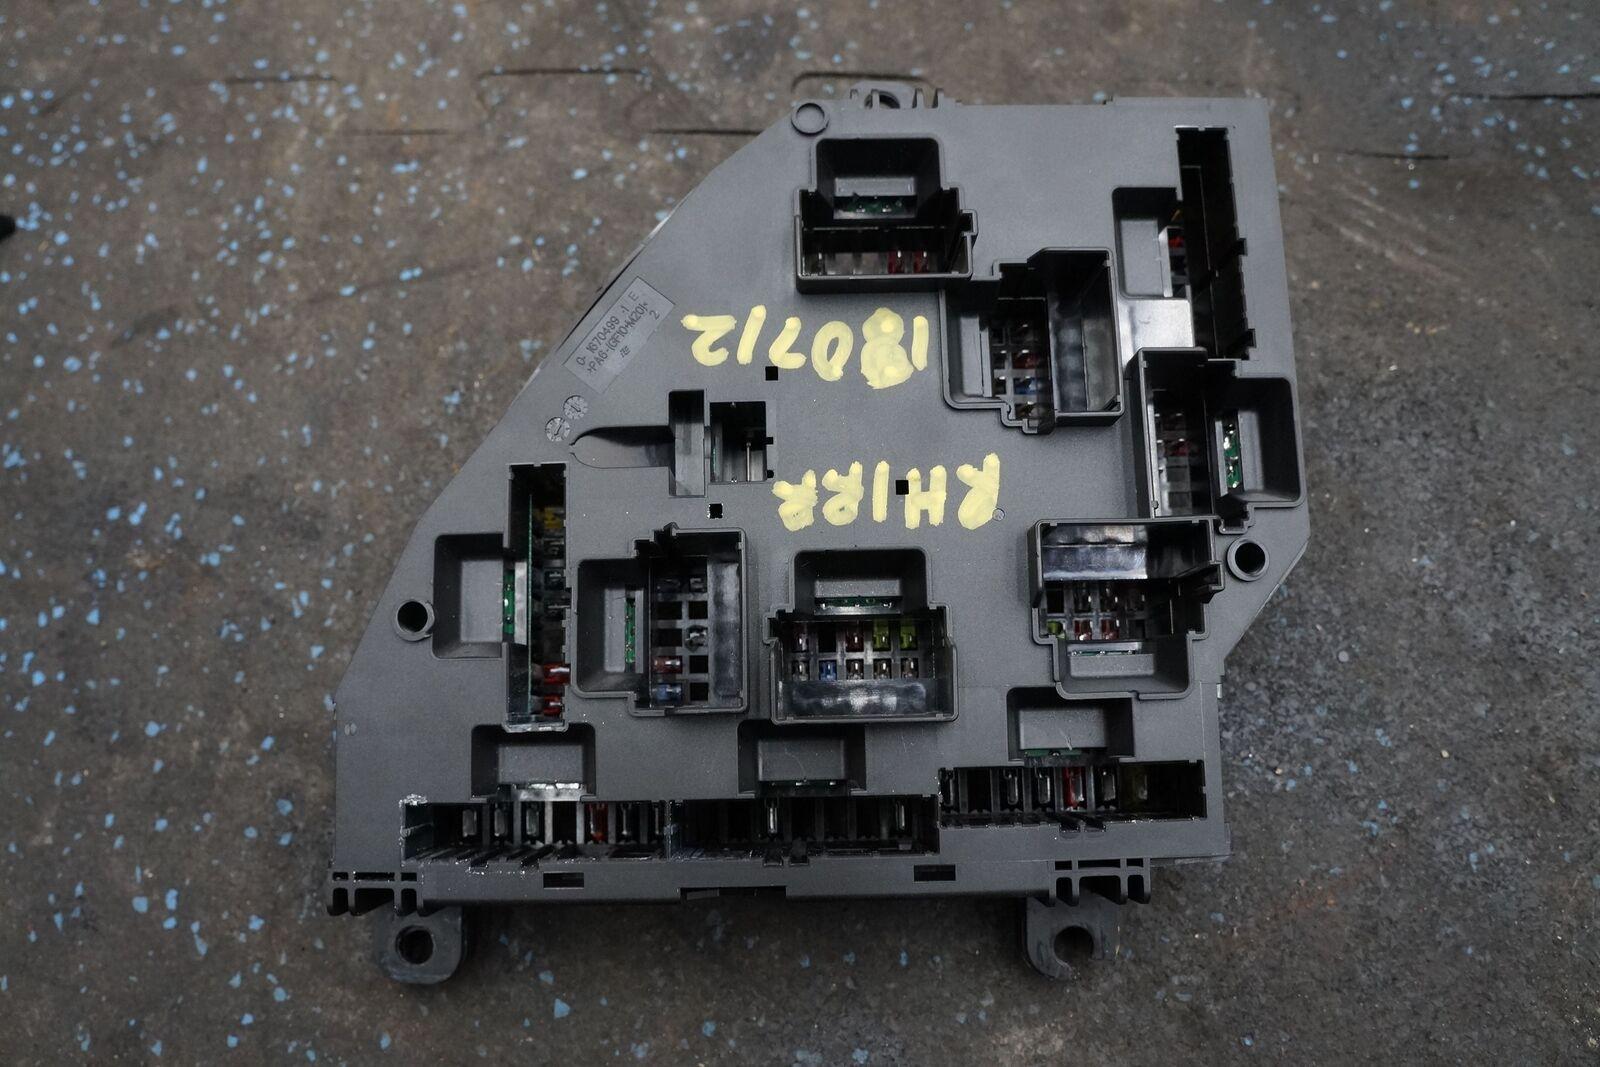 2013 Bmw M5 Fuse Box Best Electrical Schematic Diagram 2010 M3 Vehicle Wiring Diagrams Rh Eklablog Co 2016